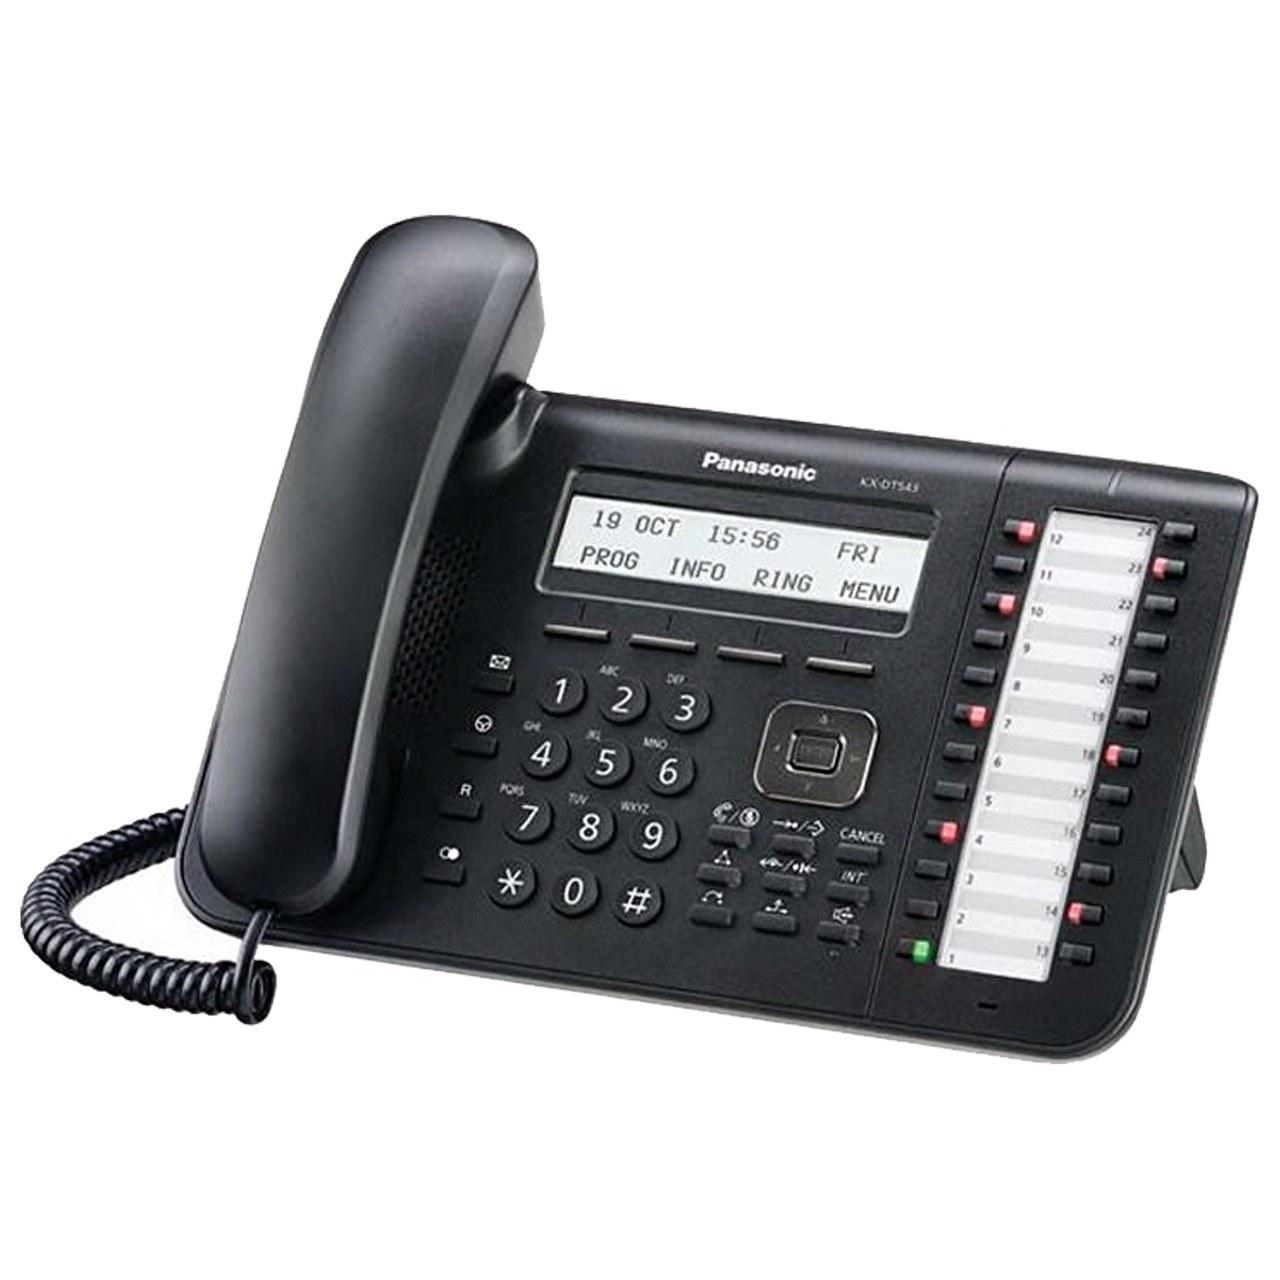 تصویر تلفن سانترال پاناسونیک مدل KX-DT543 Panasonic KX-DT543 Telephone